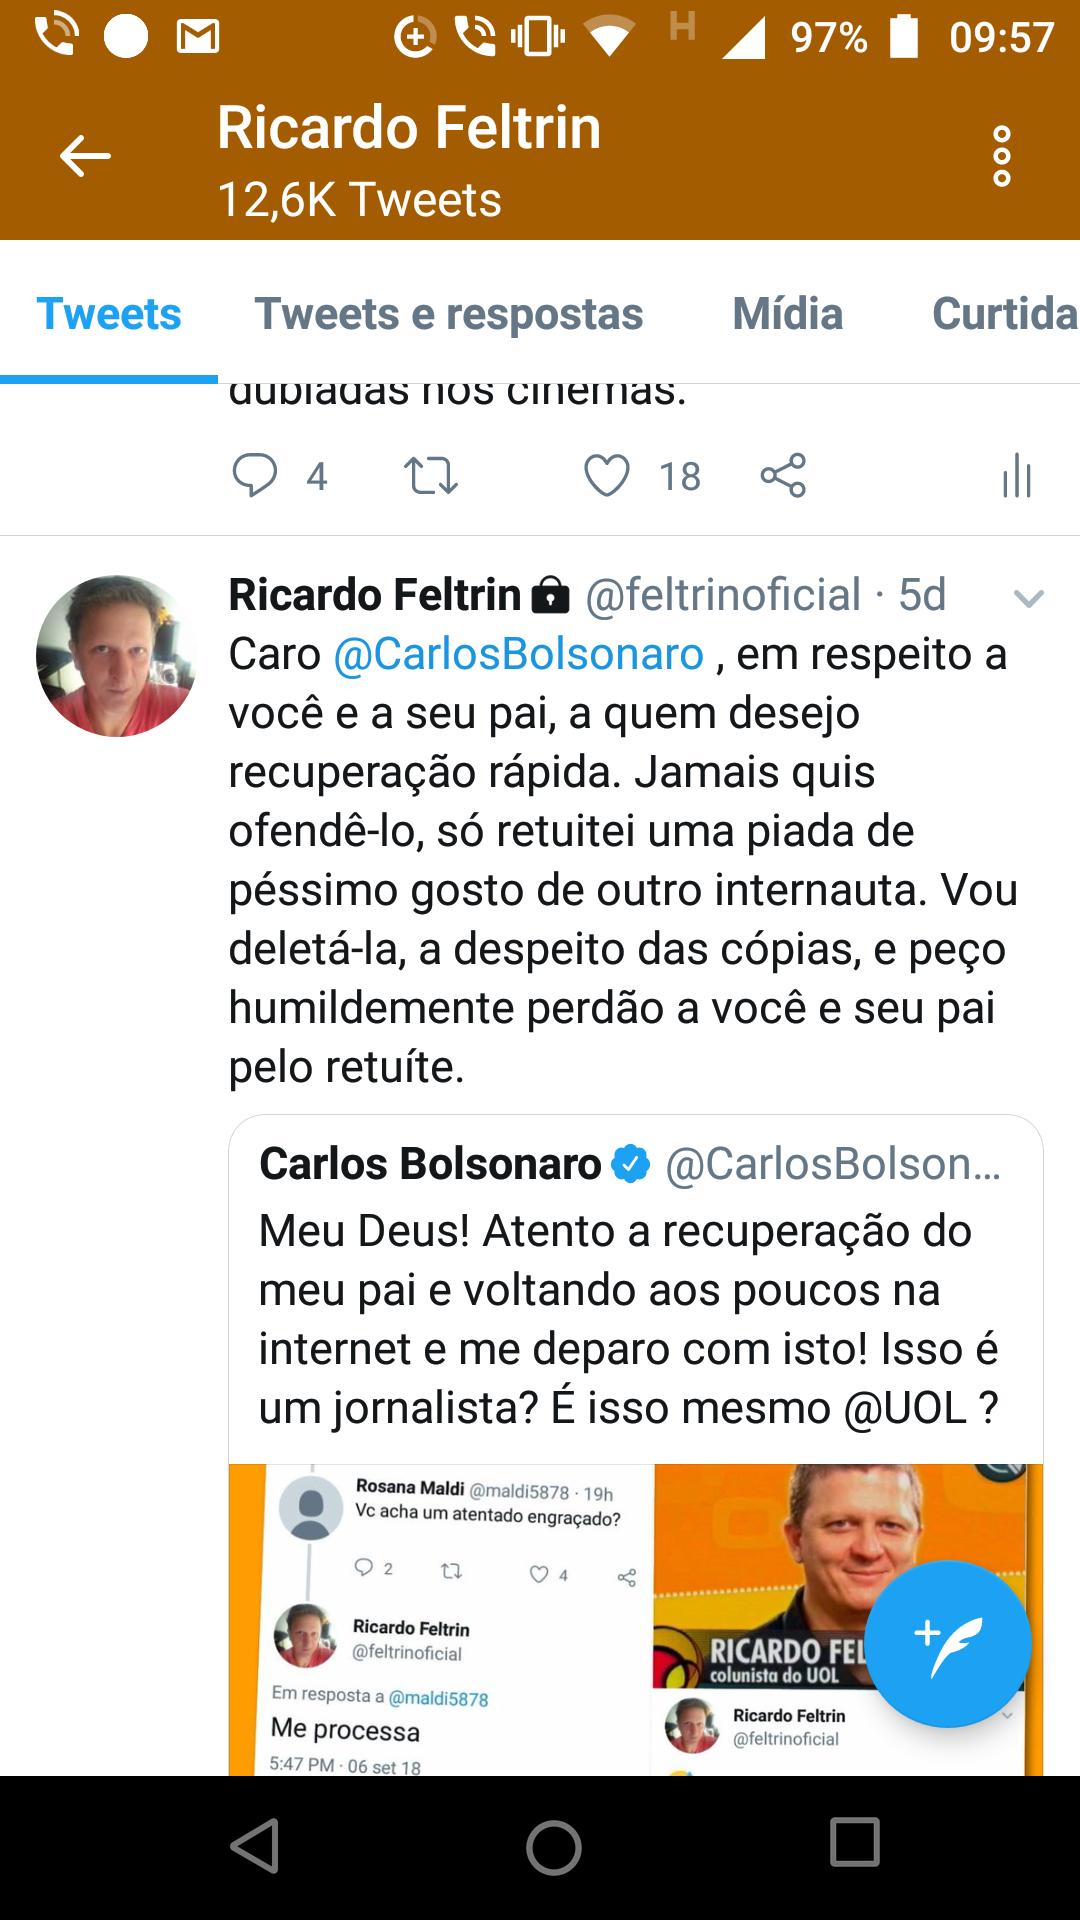 Pedido de desculpas de Ricardo Feltrin a Carlos Bolsonaro